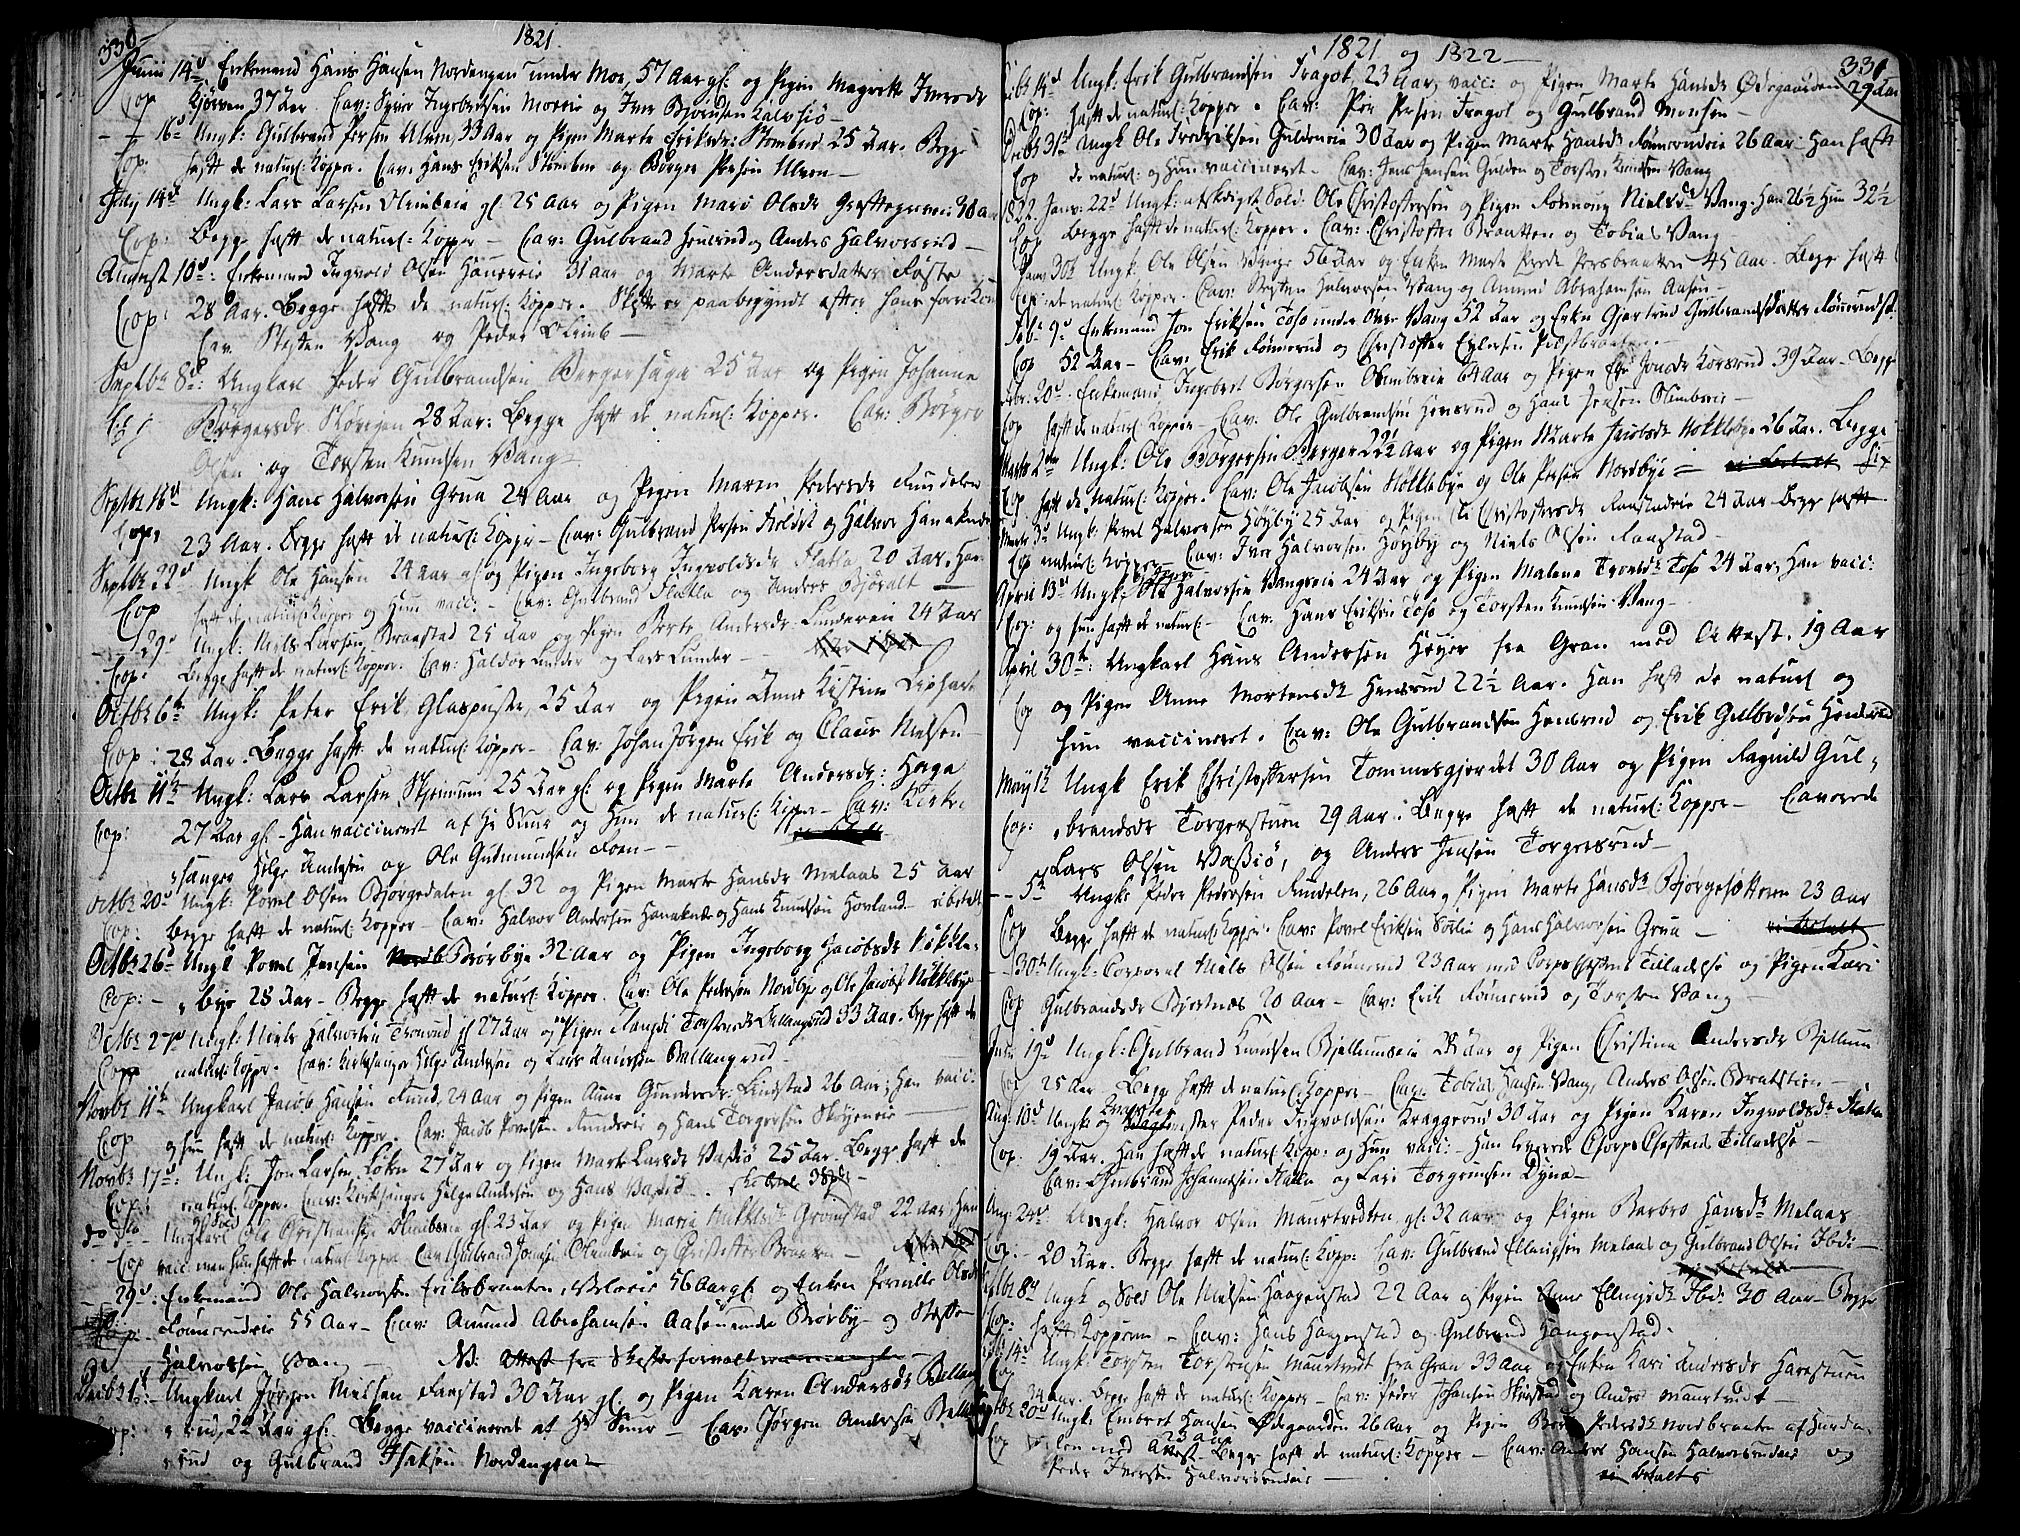 SAH, Jevnaker prestekontor, Ministerialbok nr. 4, 1800-1861, s. 330-331